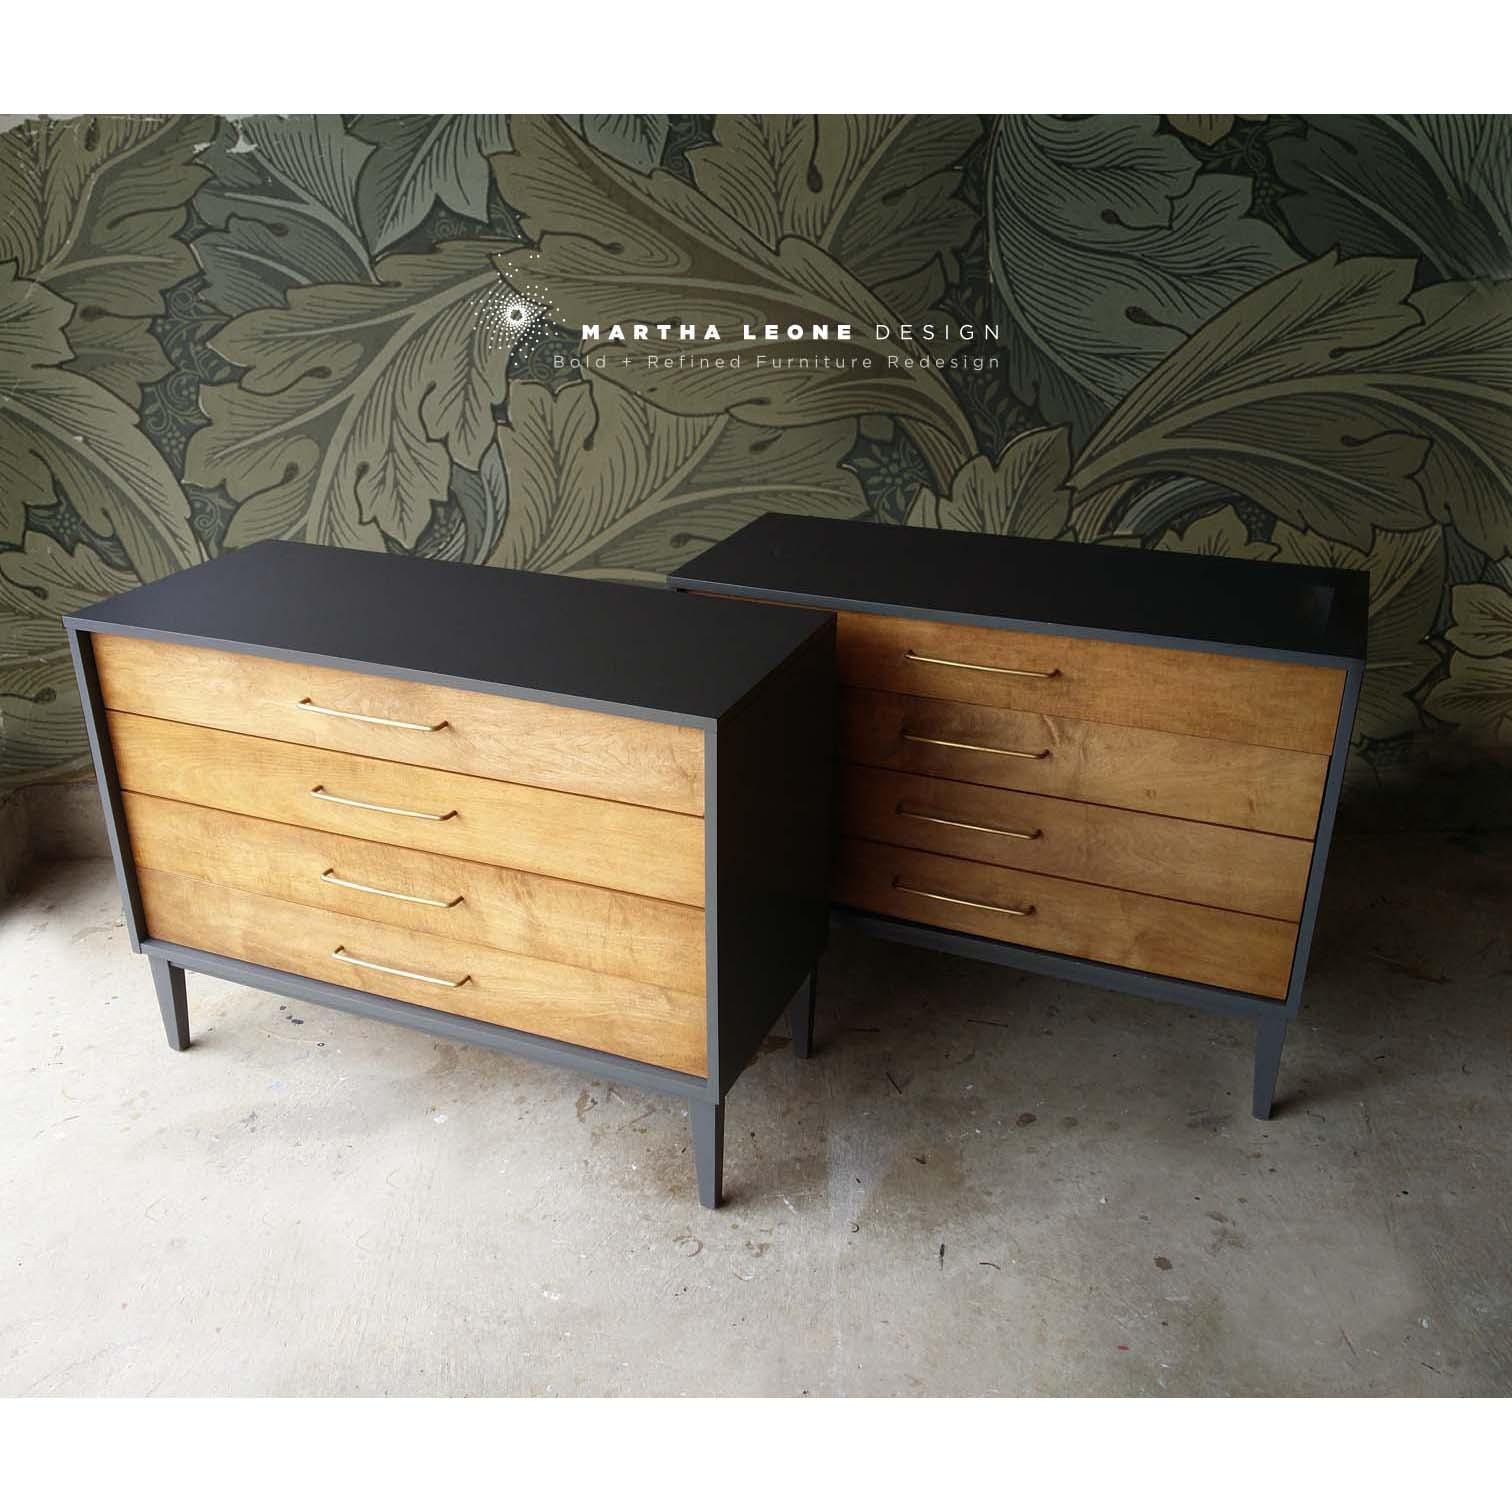 2 cabinetsE martha leone design.jpg